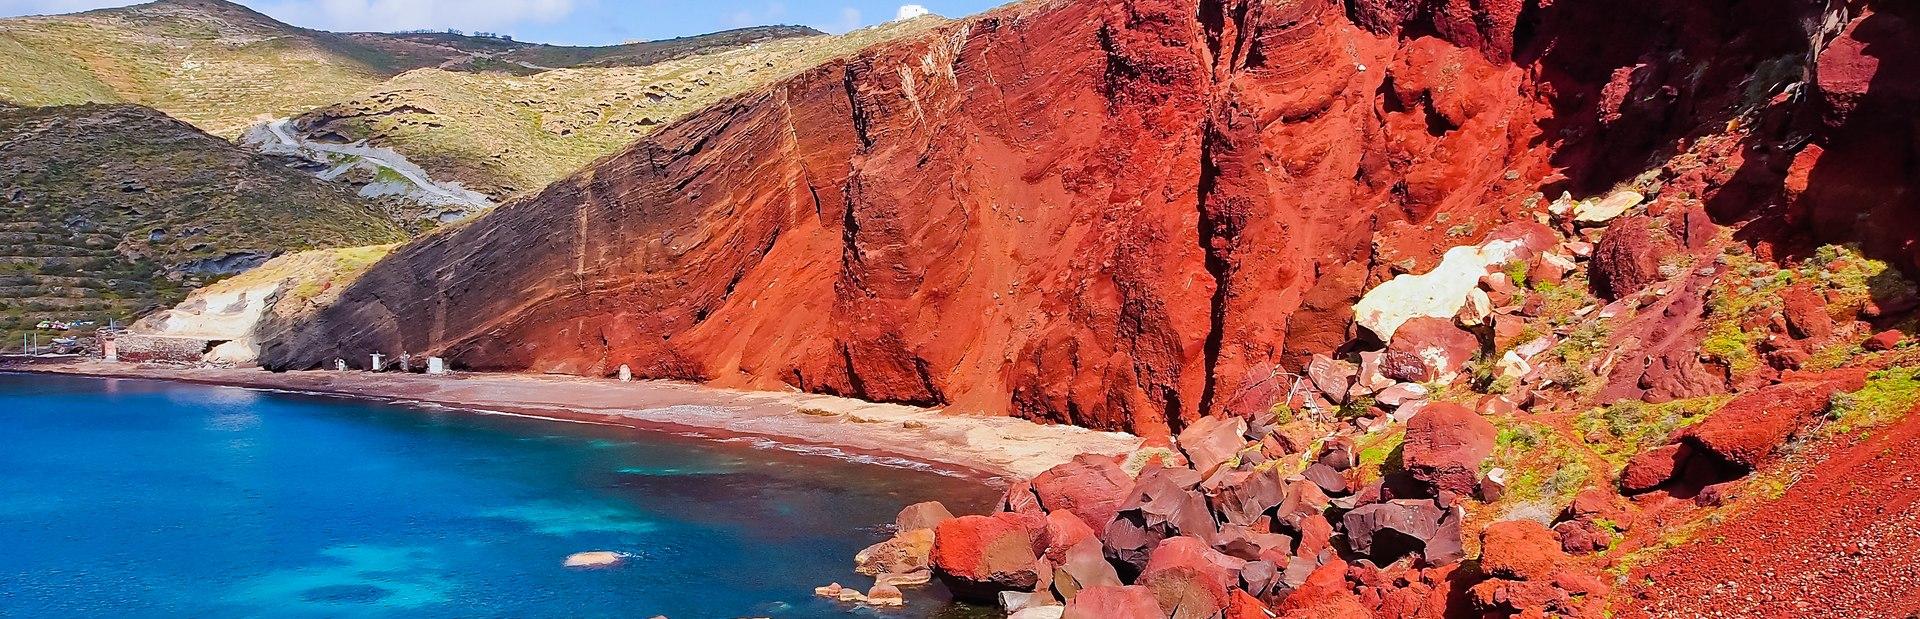 Kokkini Beach (Red Sand Beach) Image 1